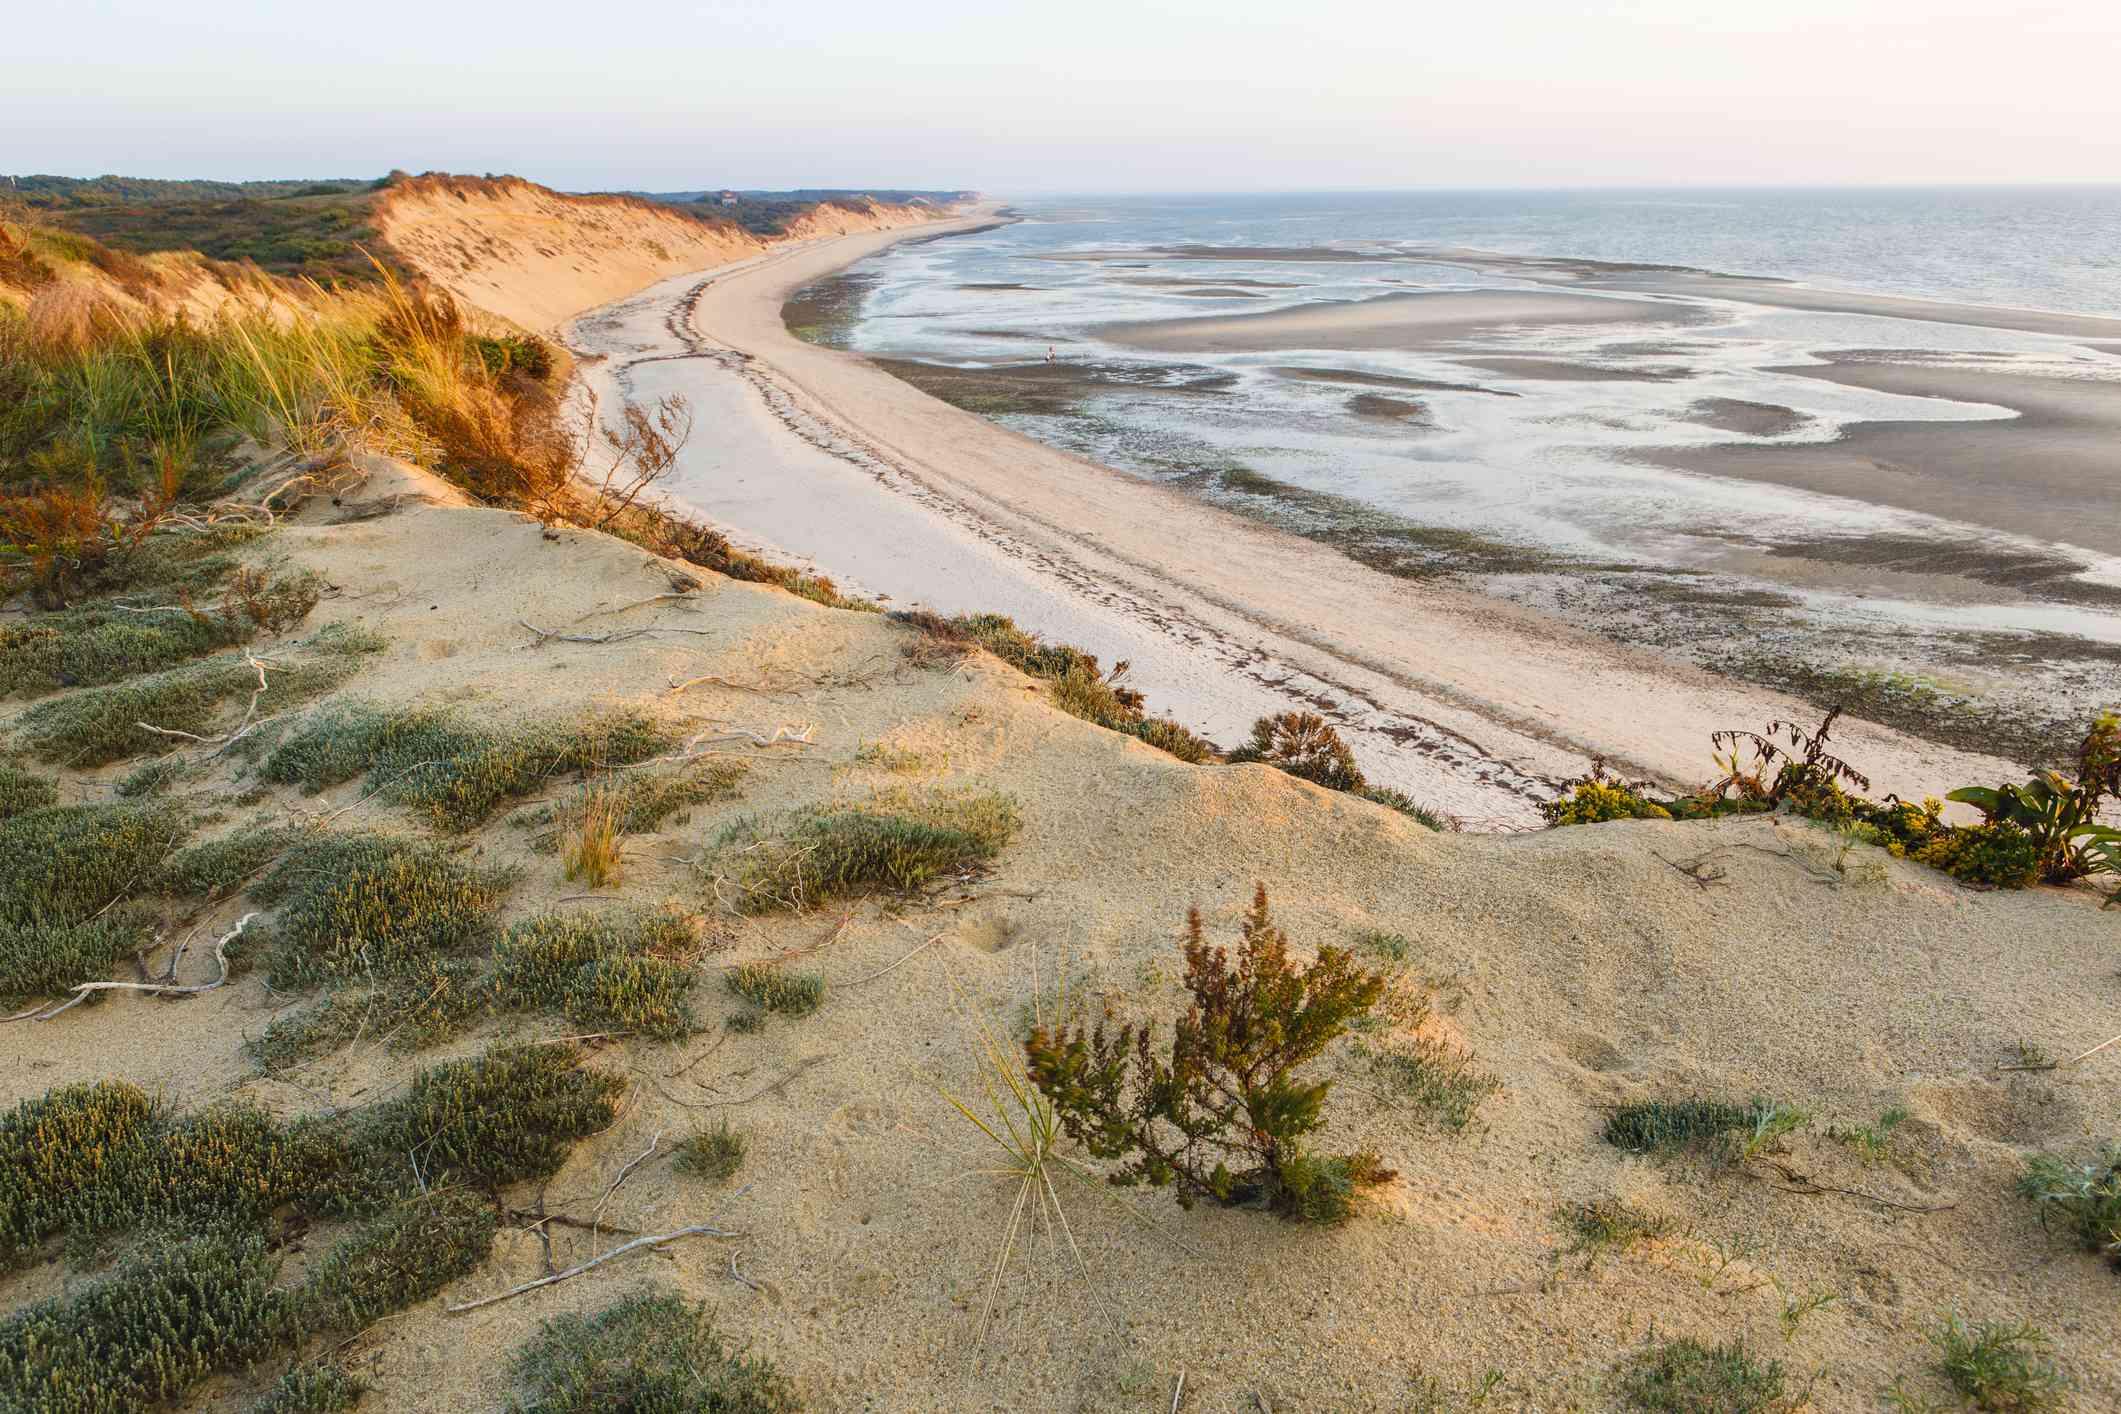 View from the dunes at Duck Harbor Beach, Wellfleet, Cape Cod National Seashore, Massachusetts, USA